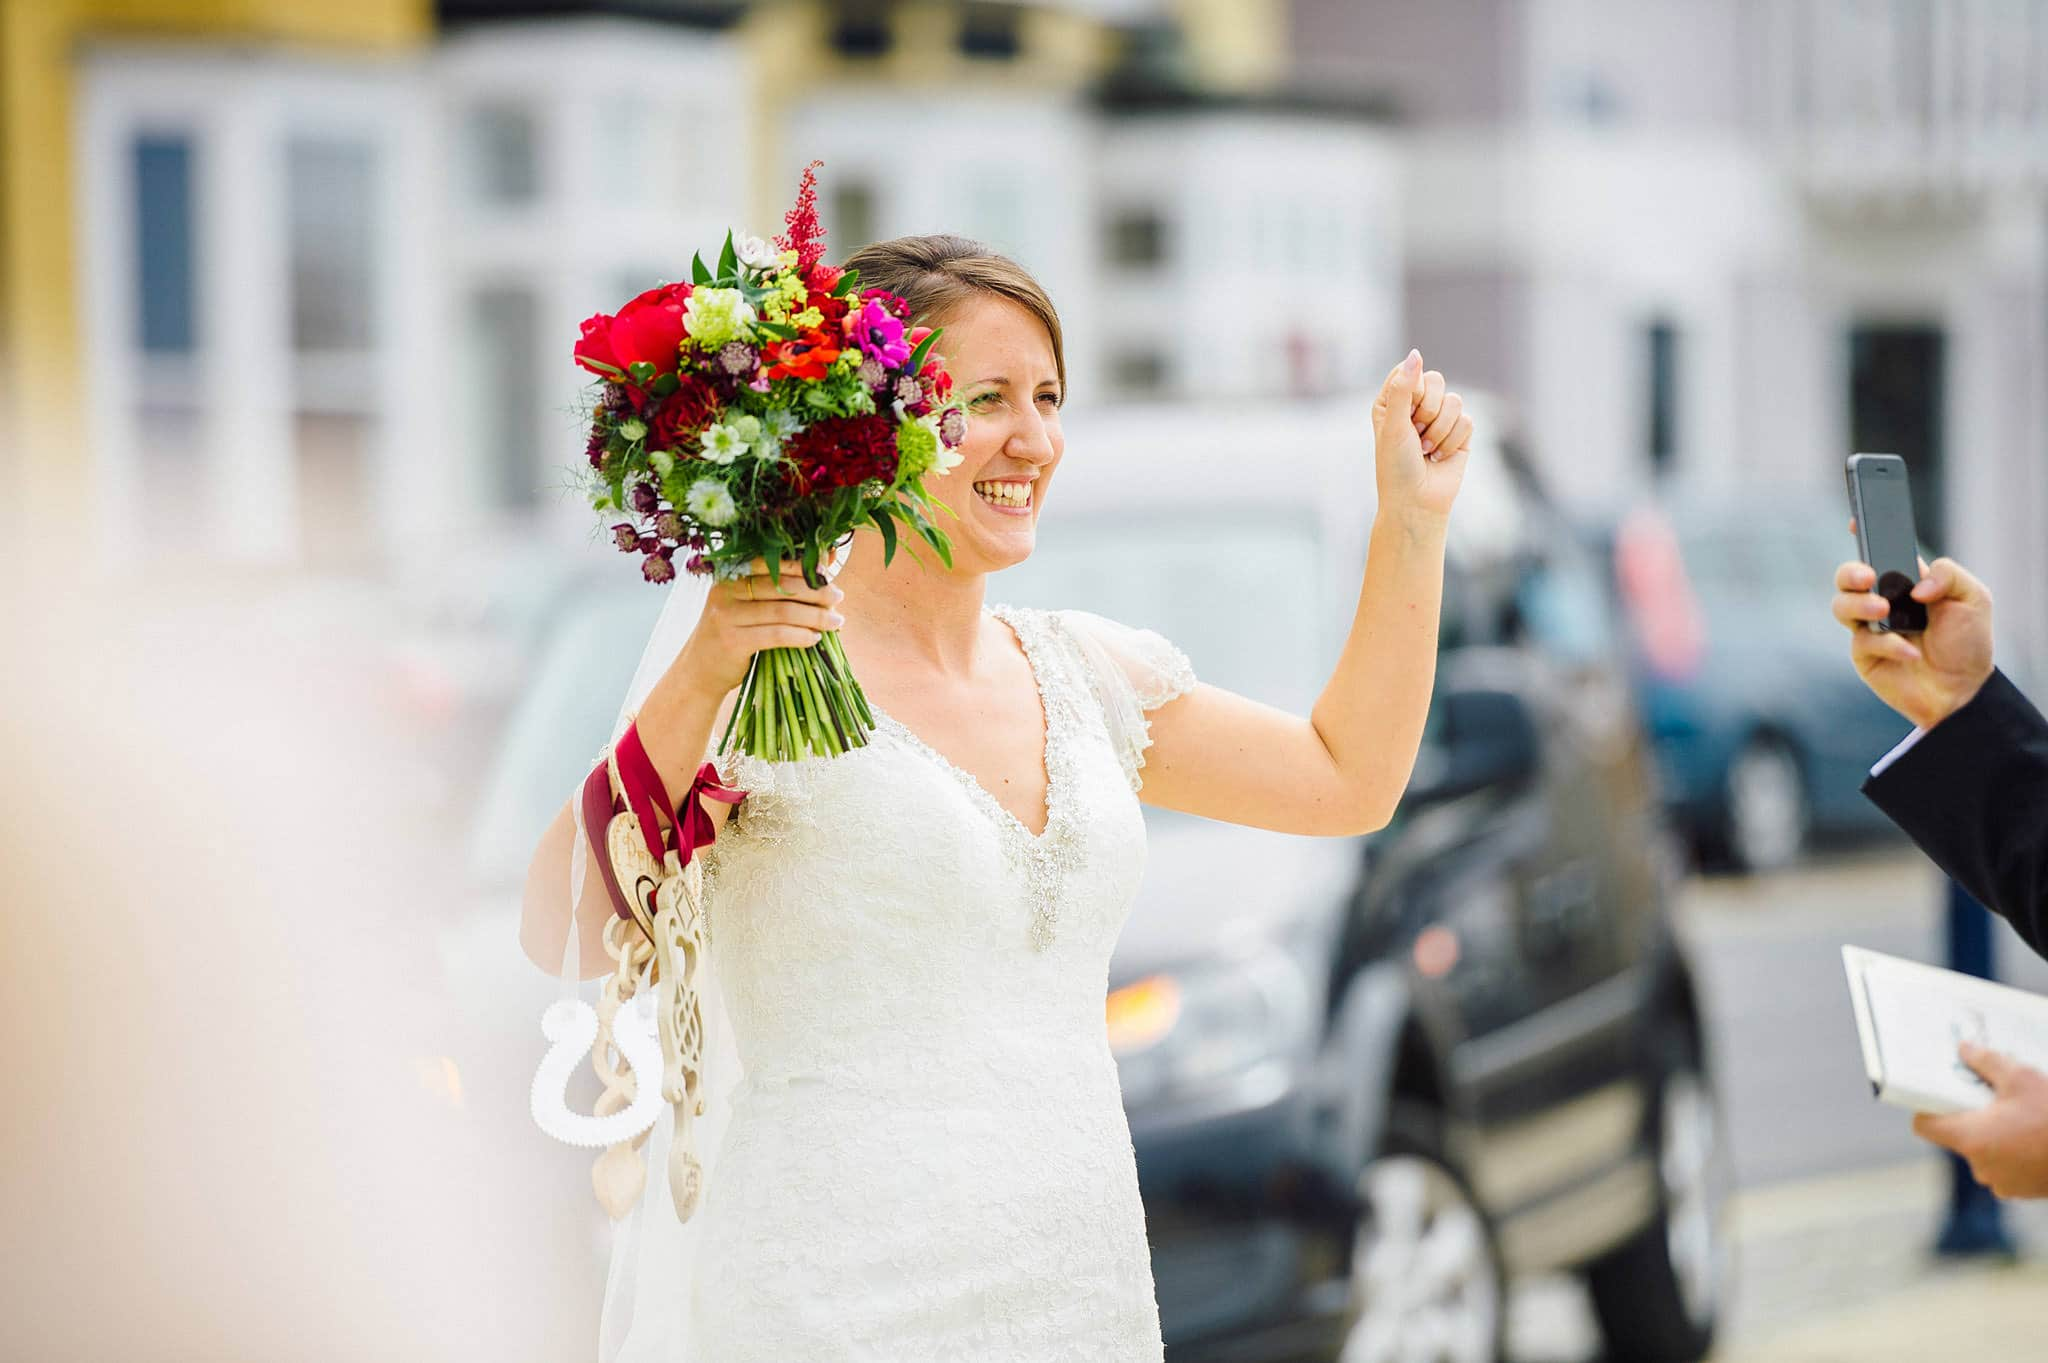 wedding-photographer-aberystwyth-wales (99)